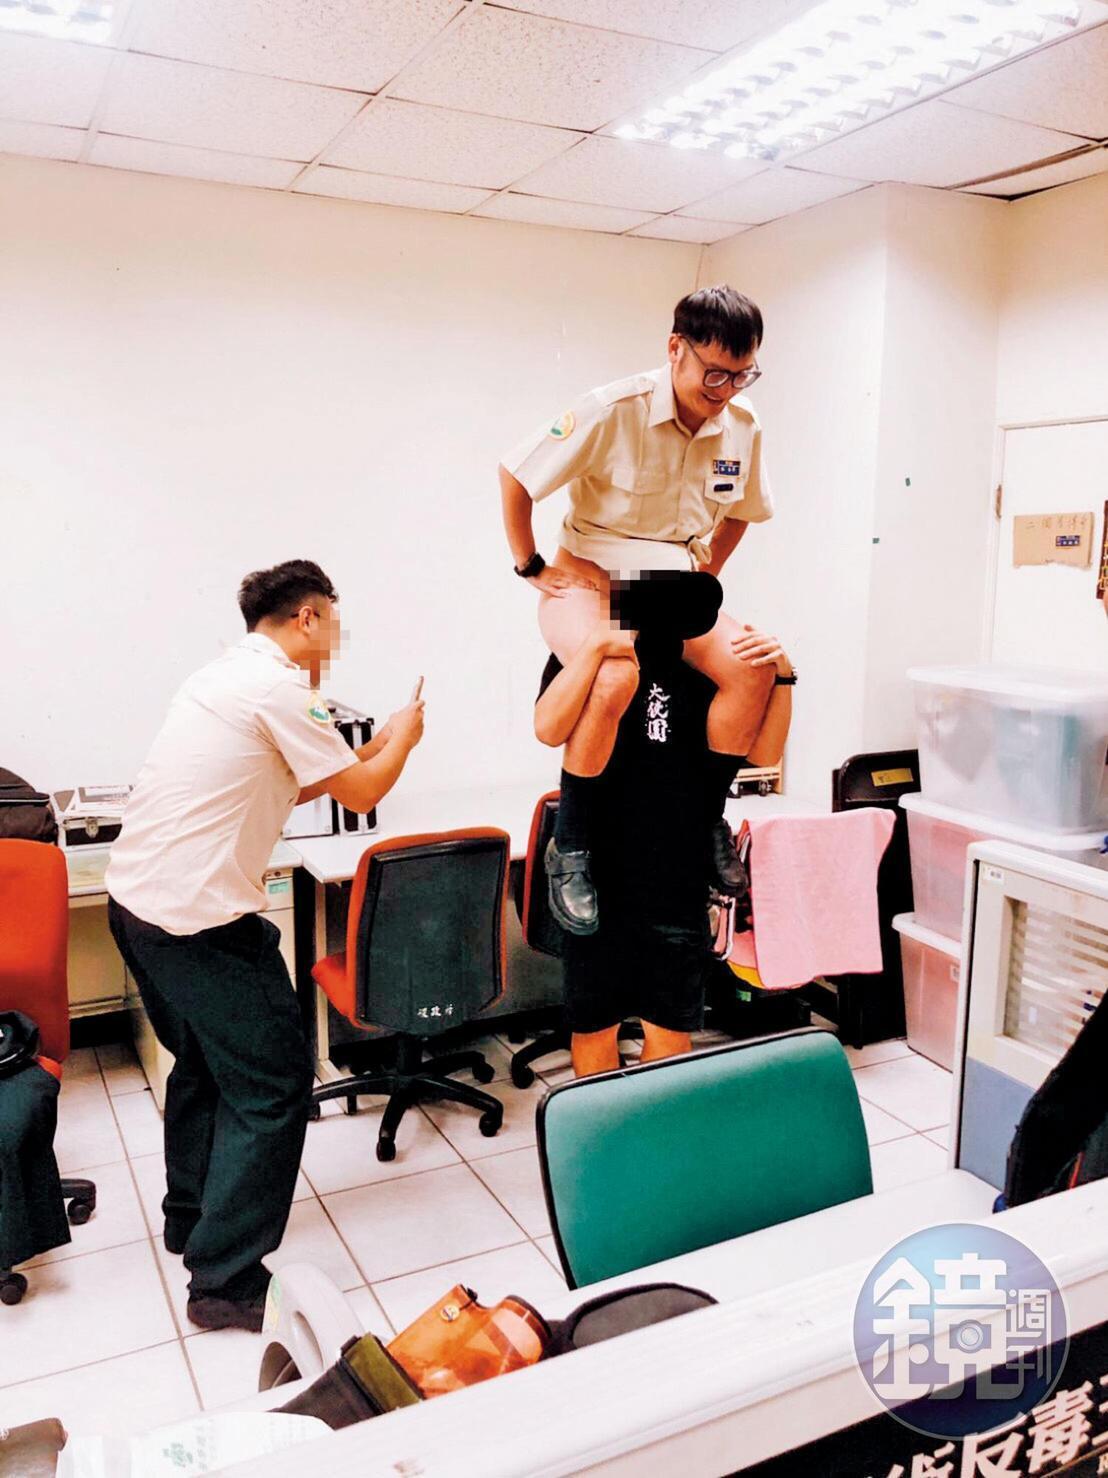 KID(右)在辦公室內,裸臀騎在同袍身上,其他人則起鬨拍照。(讀者提供)